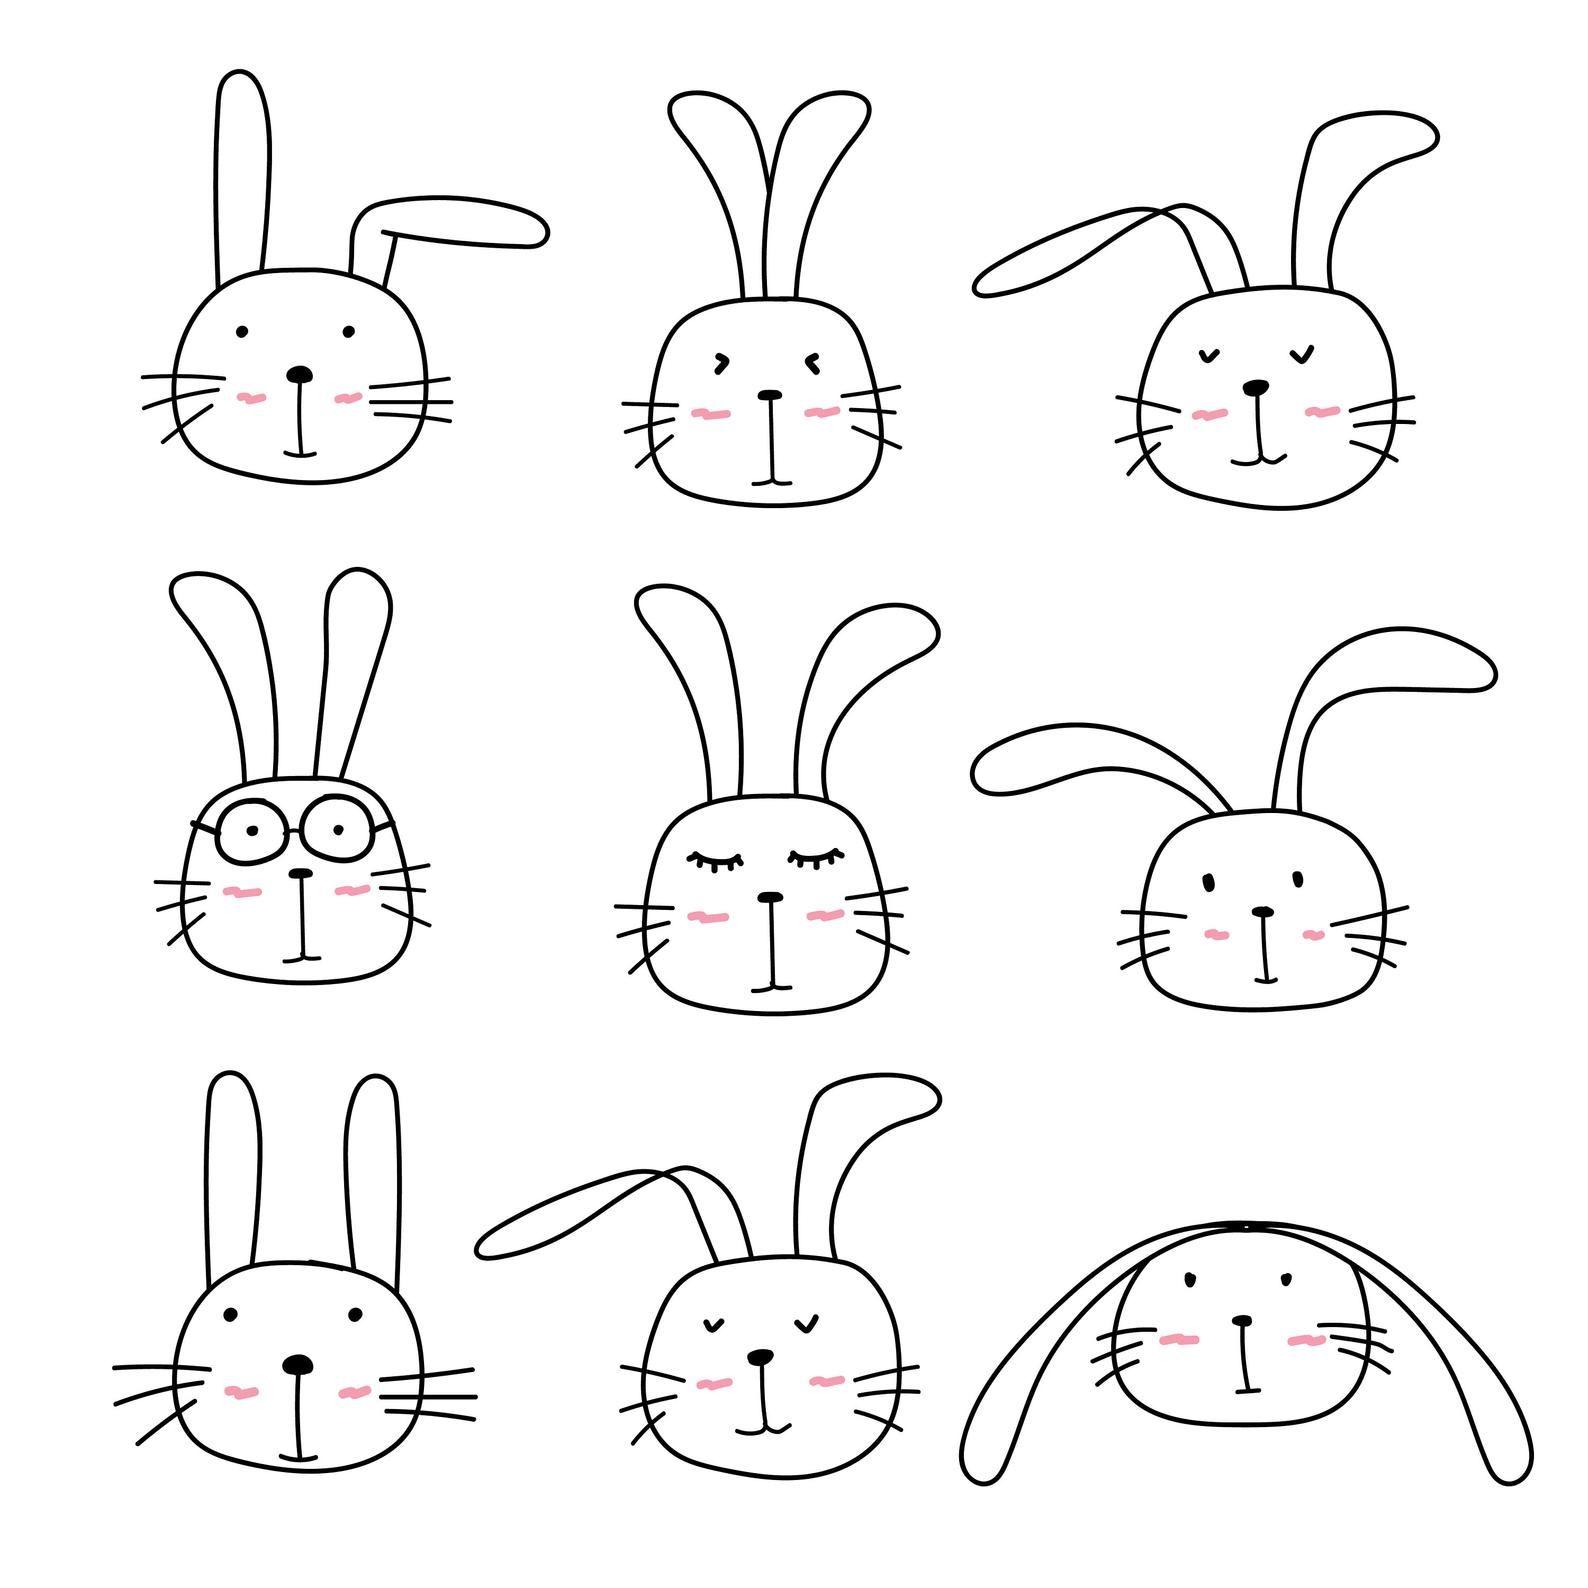 Cute Bunny Clipart Cute Animal Clipart Rabbit Clipart Etsy In 2021 Rabbit Clipart Cute Animal Clipart Bunny Drawing